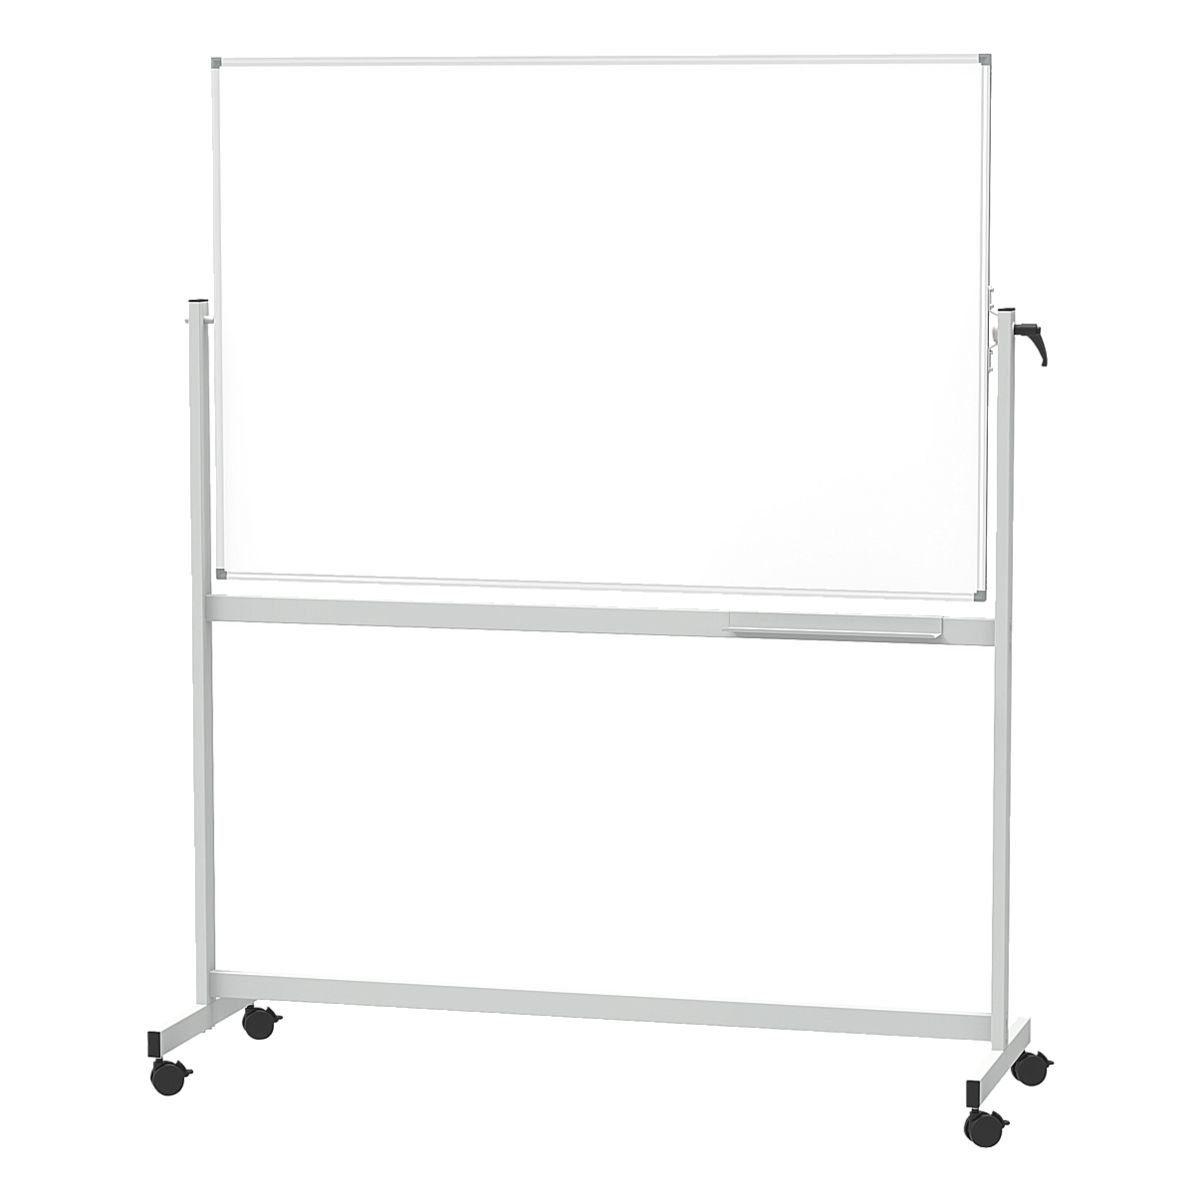 Maul Whiteboard kunststoffbeschichtet, 220 x 120 cm »Maul Standard 6459684«